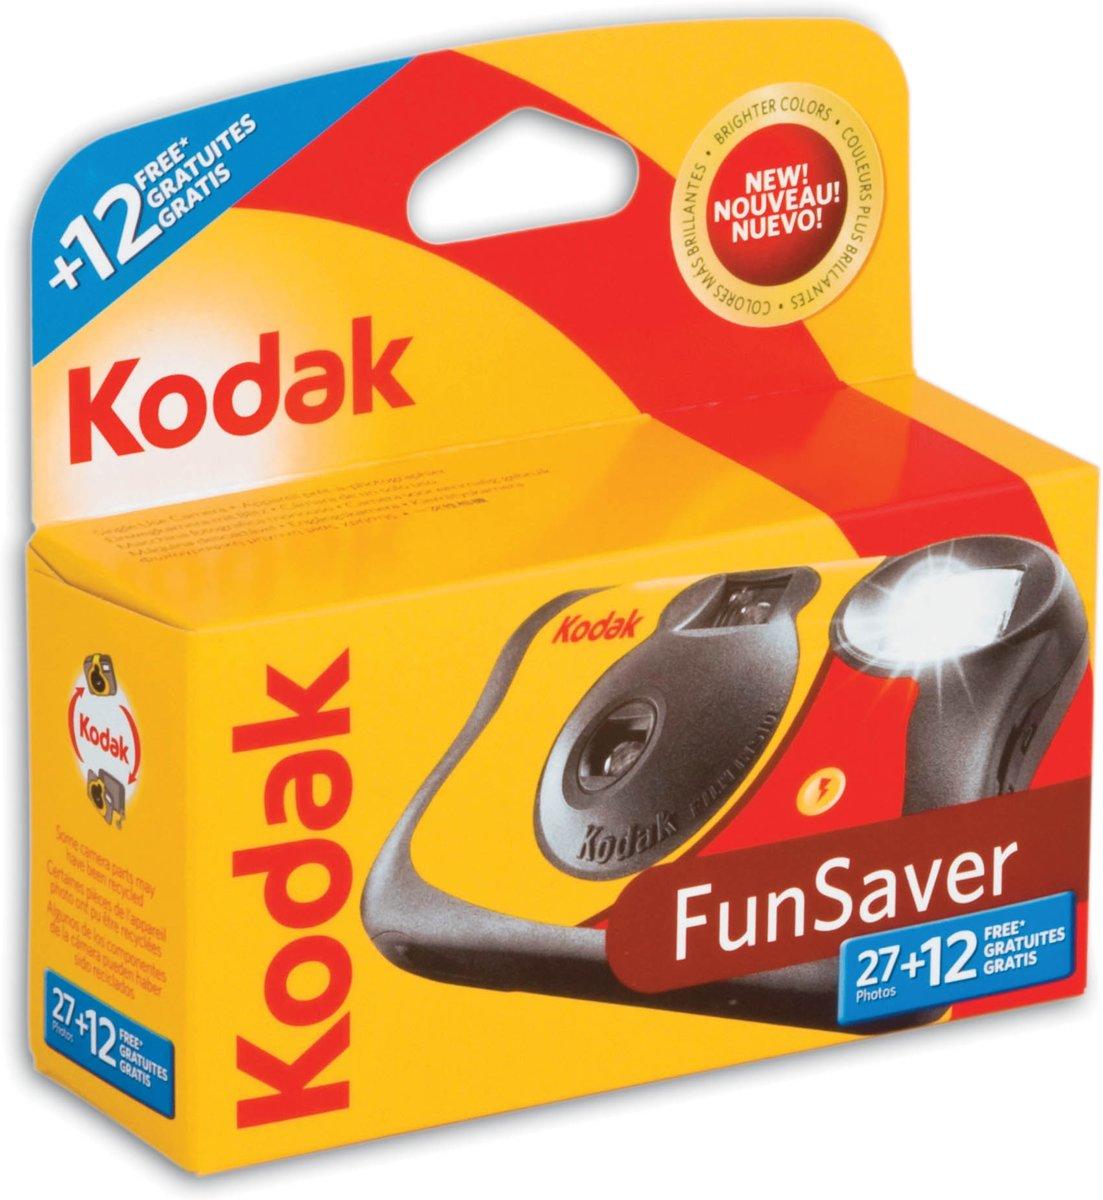 Kodak - Wegwerpcamera met flitser - 27+12 foto's kopen